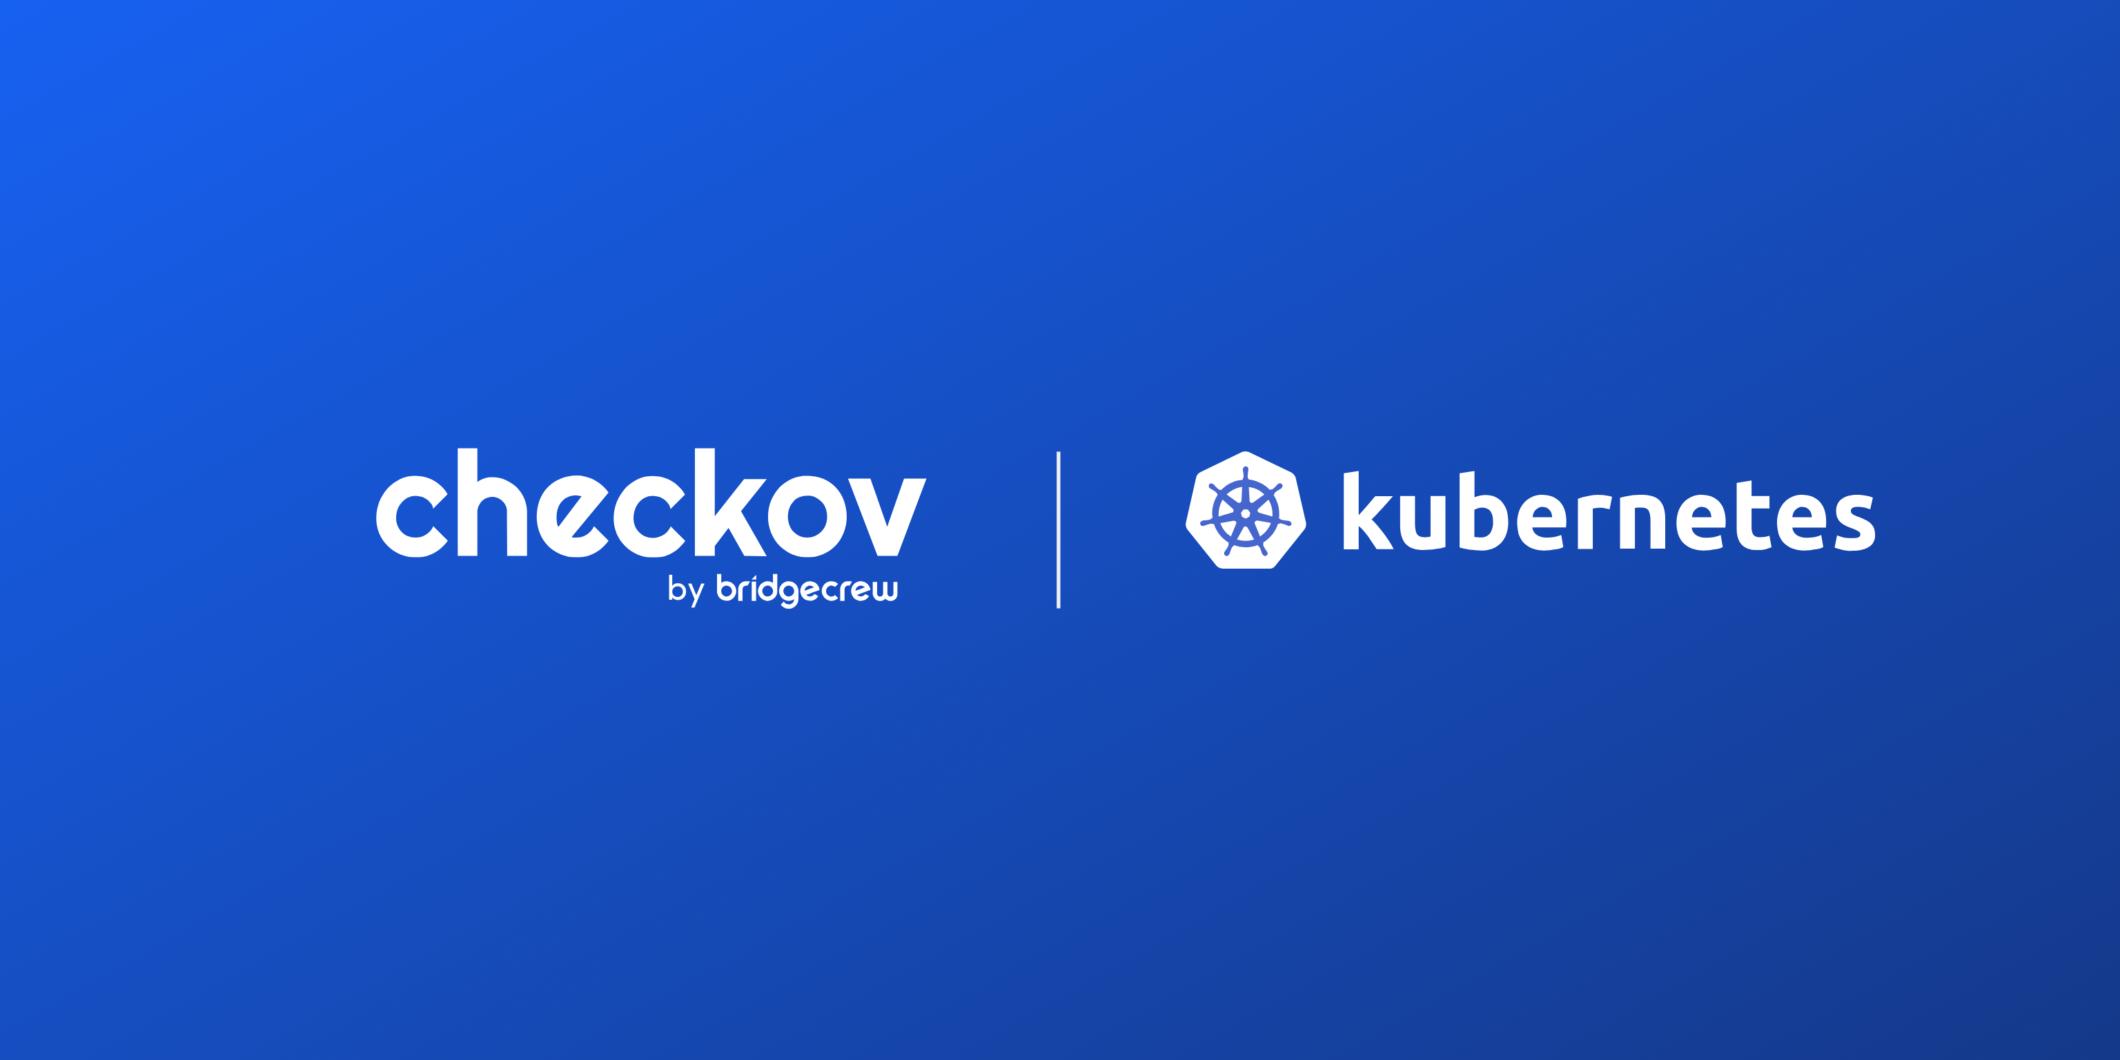 Checkov by Bridgecre & Kubernetes logo